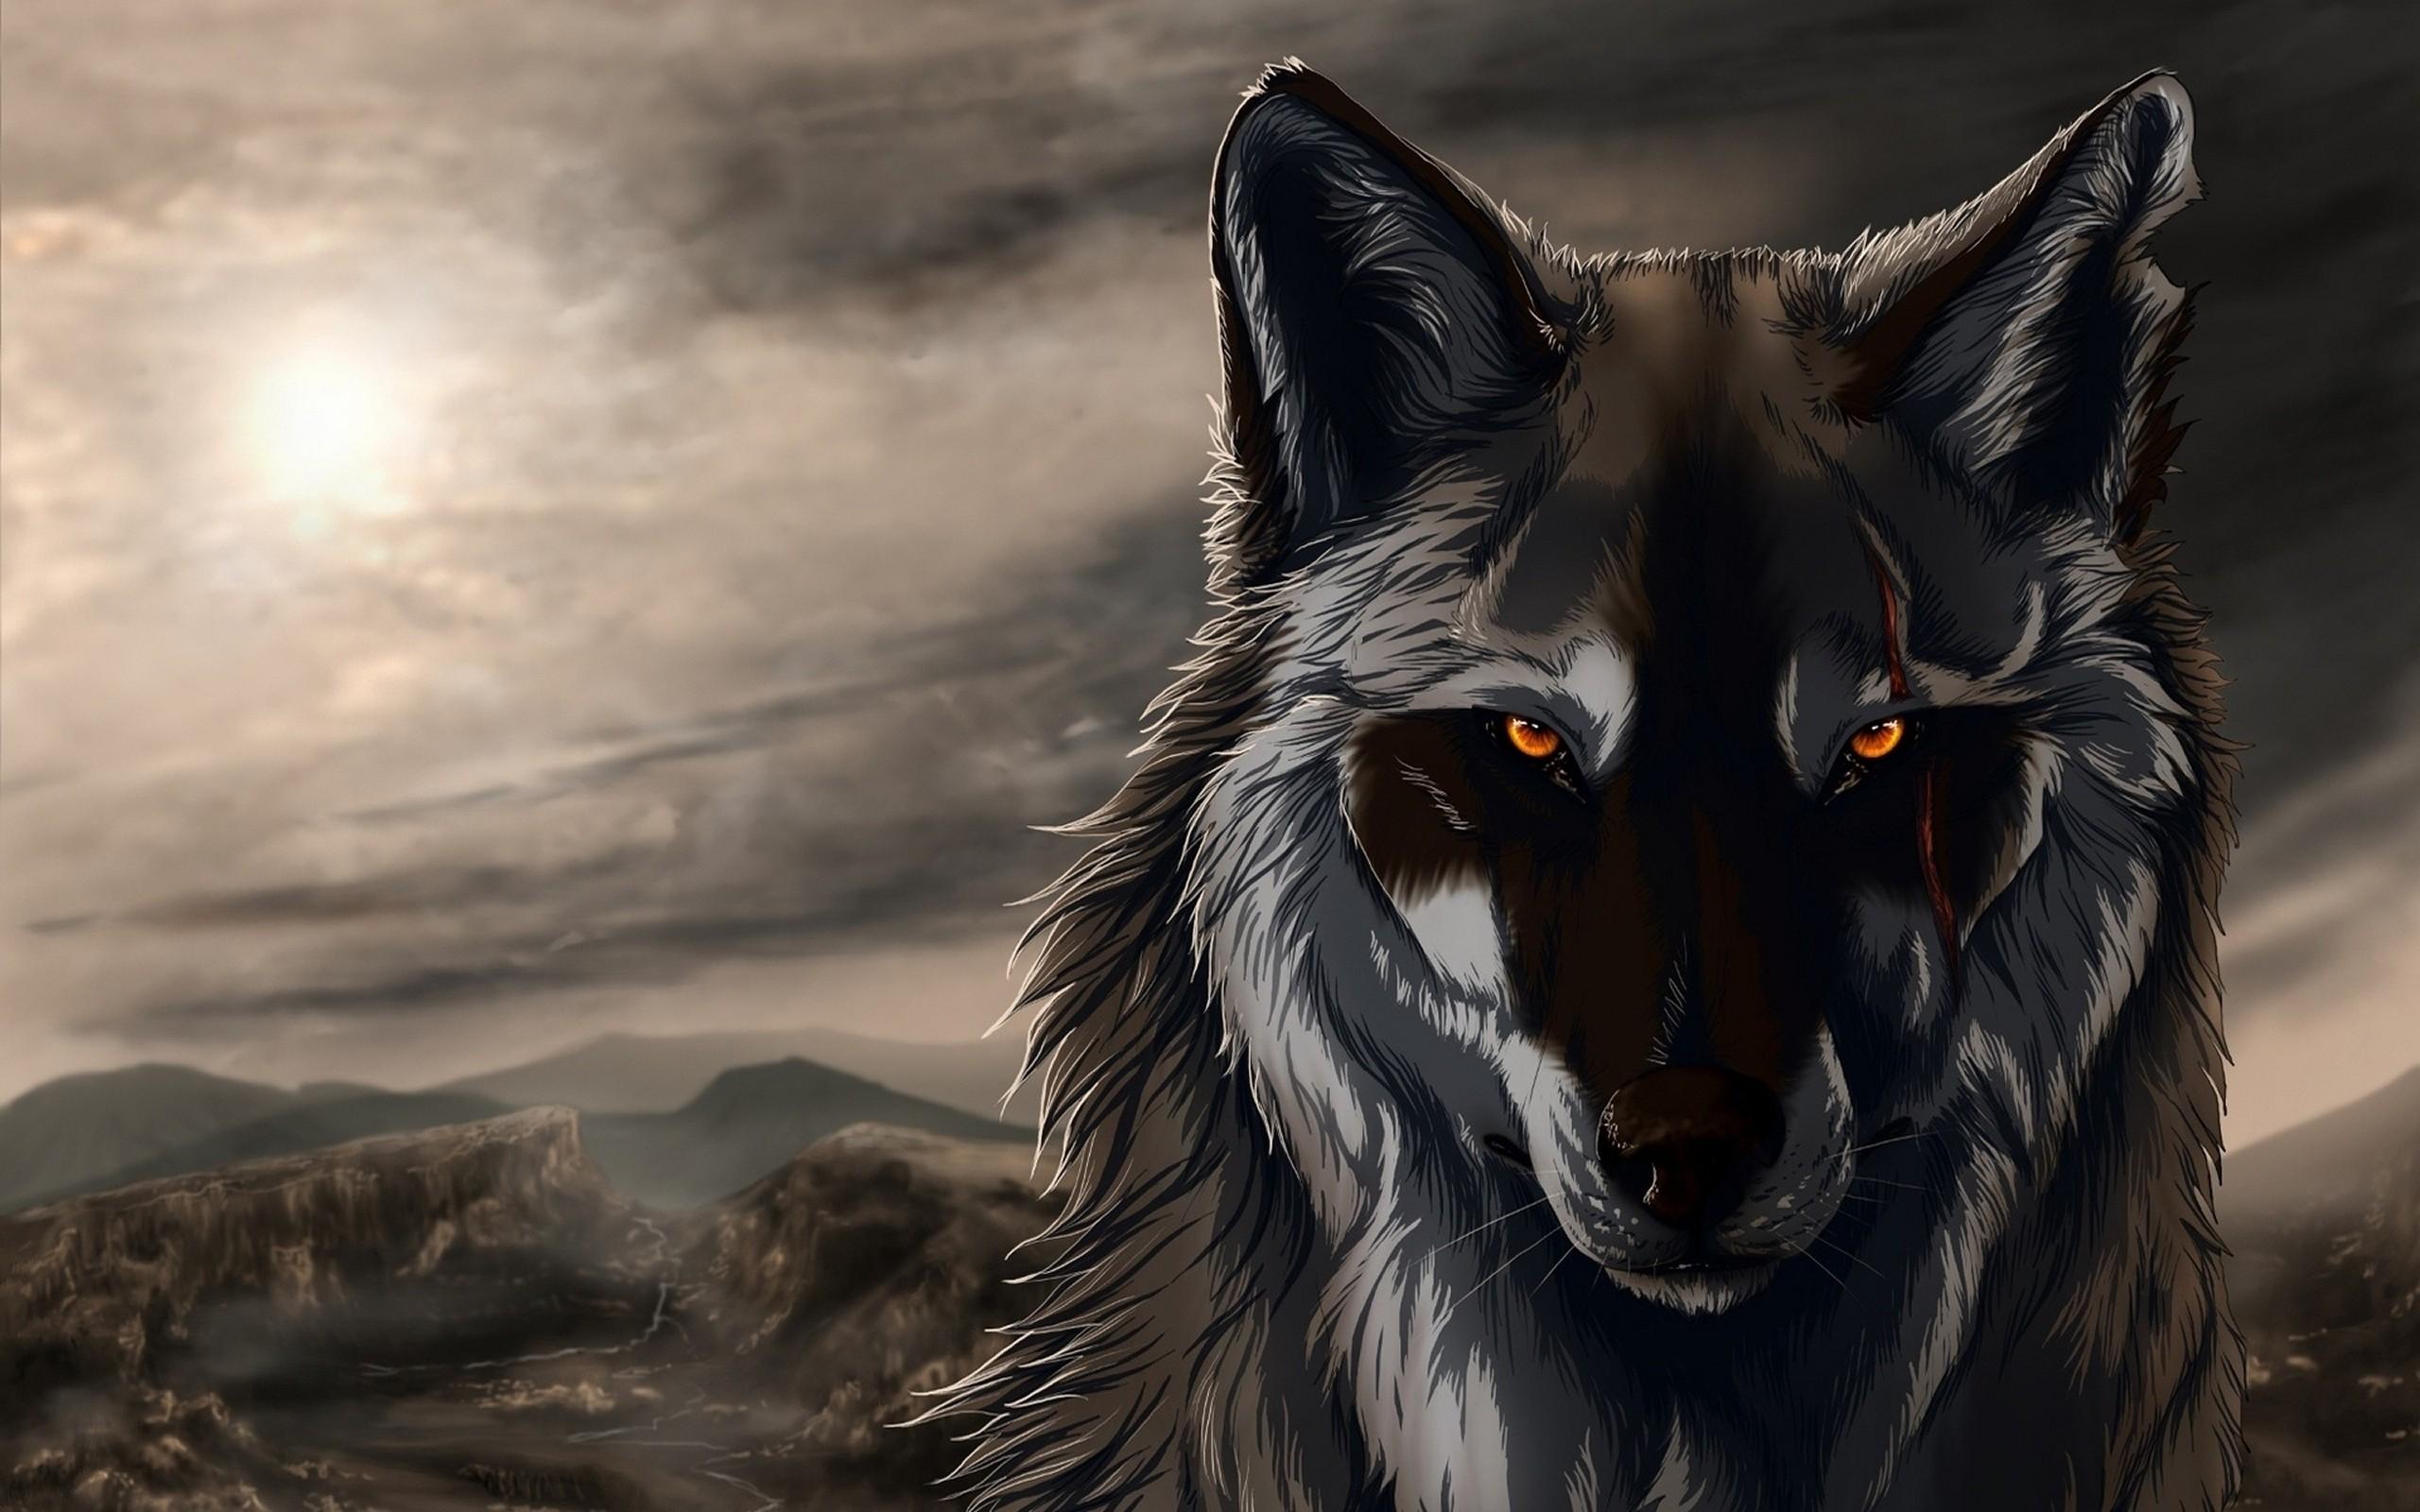 Animated wolf wallpaper wallpapersafari for Exclusive 3d wallpaper